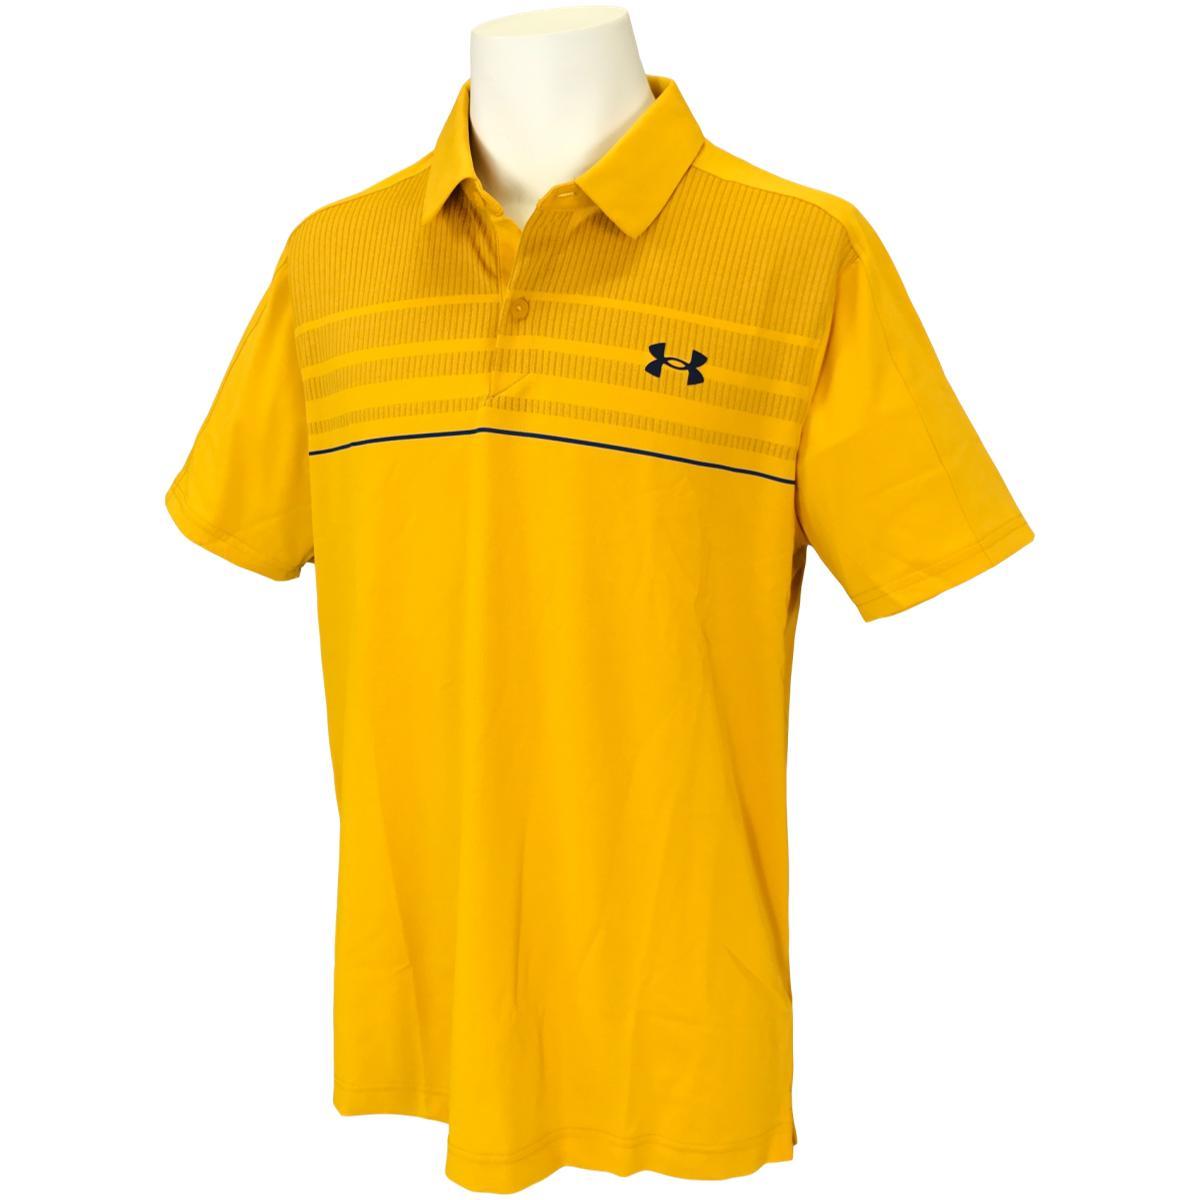 UA ヴァニッシュ 1アップ 半袖ポロシャツ